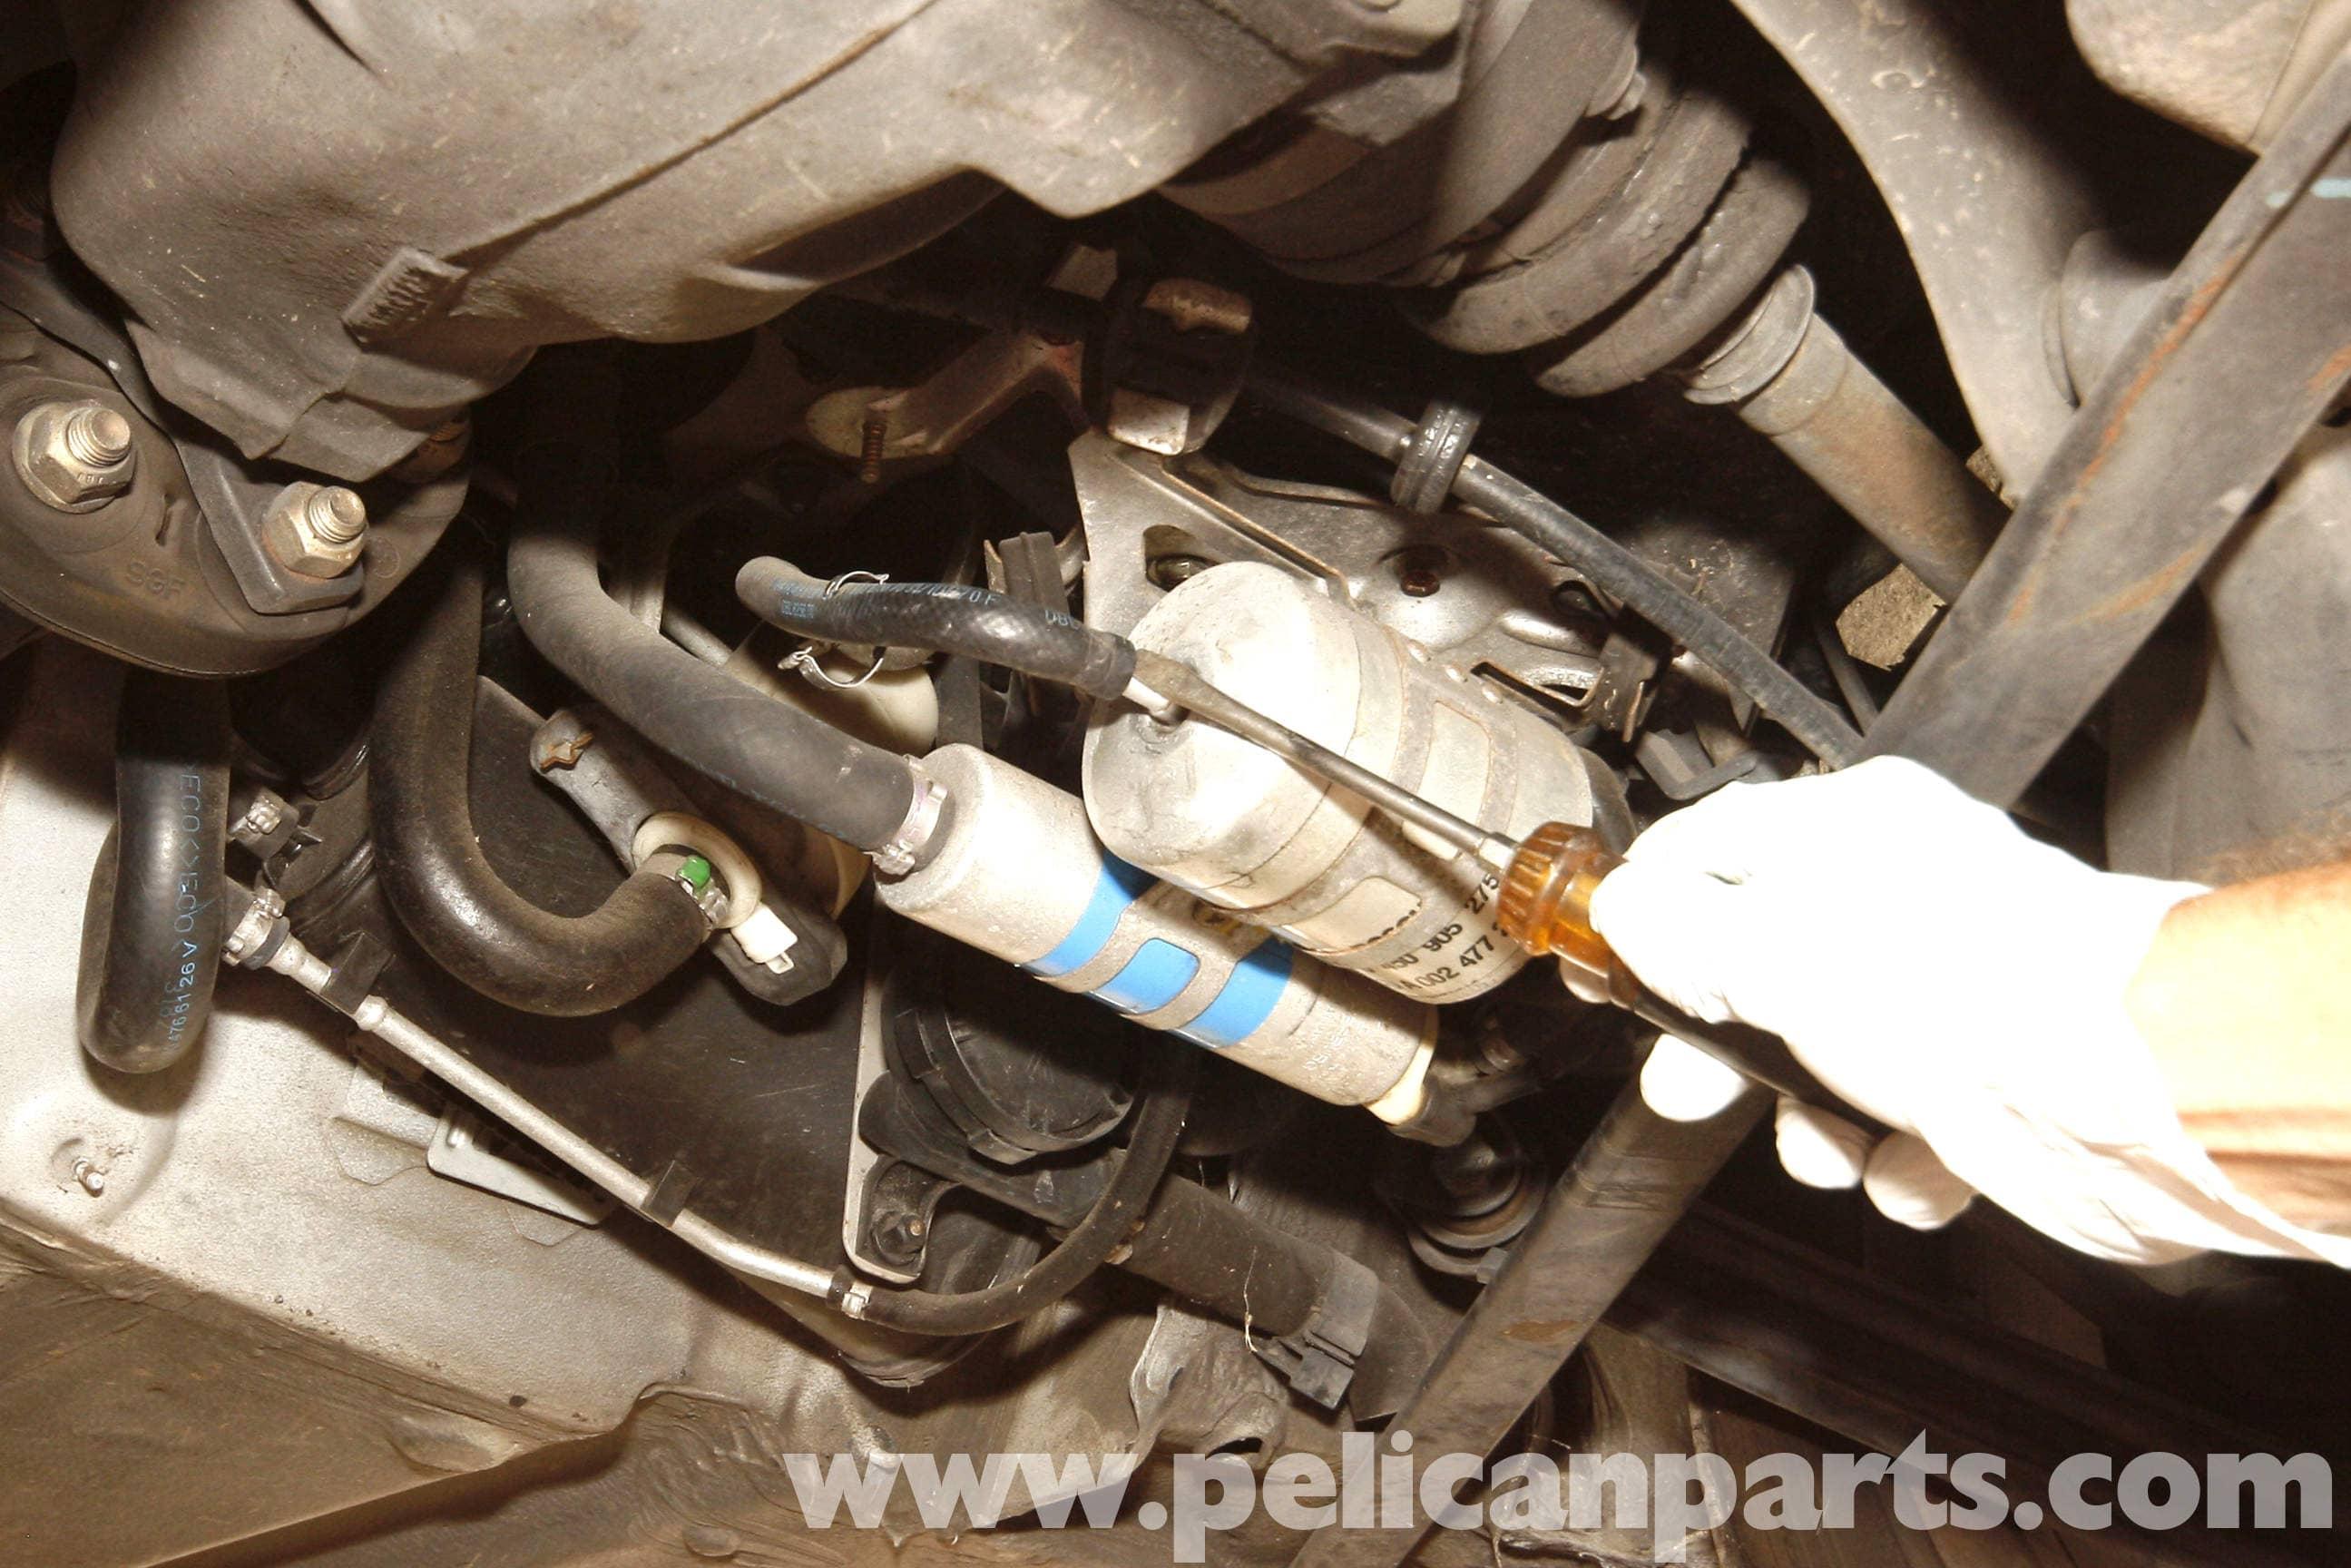 Mercedes-Benz SLK 230 Fuel Filter Replacement | 1998-2004 ...